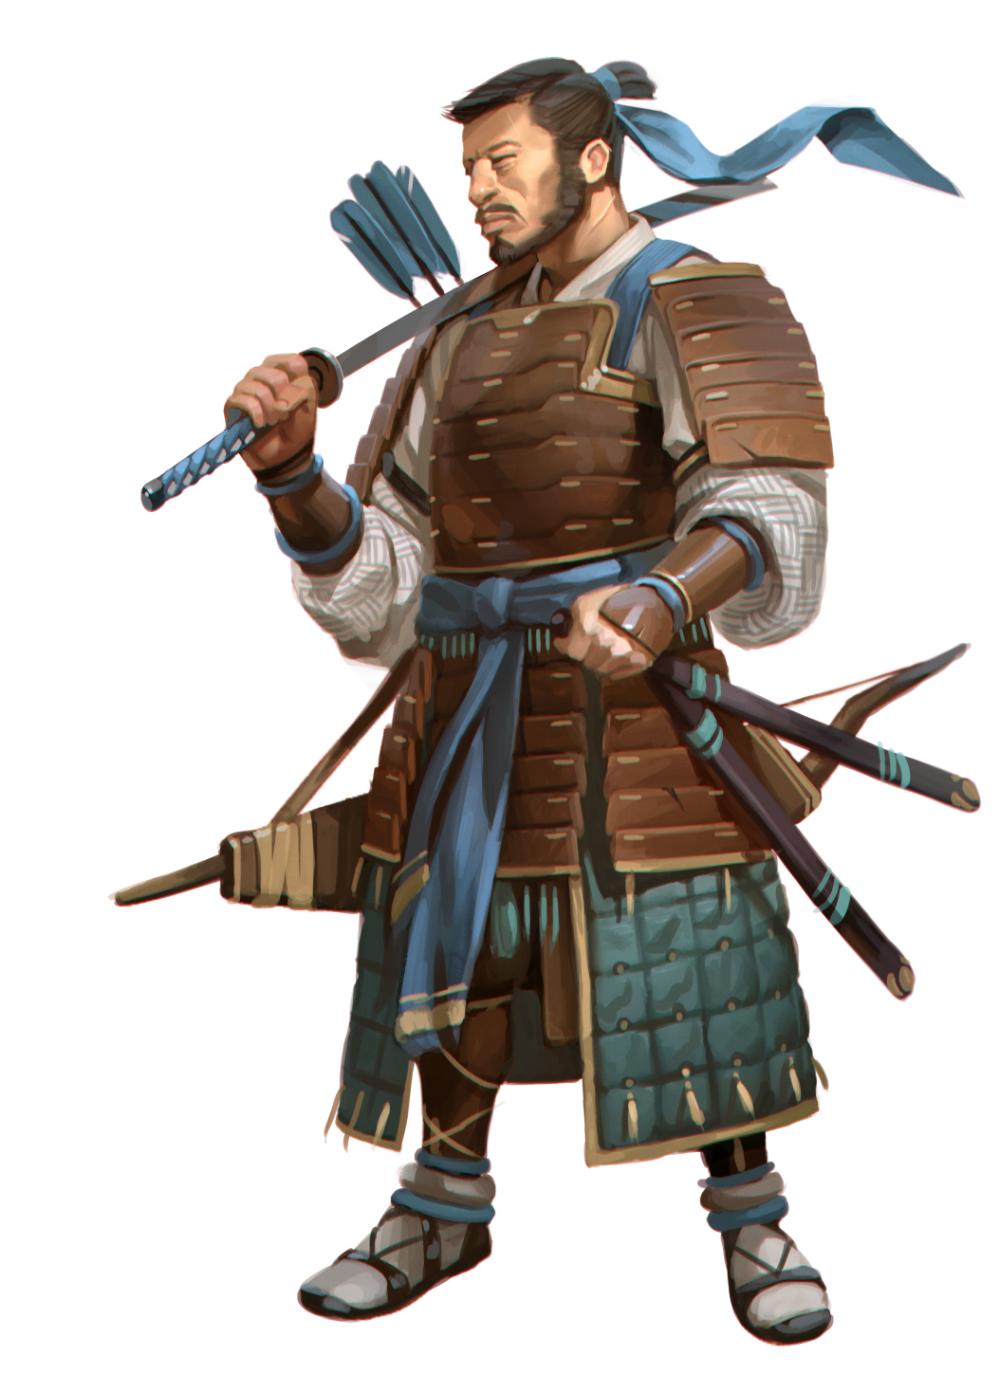 Rugged Male Character Design Male Character Design Older Nerd Male Character Design Anatomymalecharacterdesign Fantasy Artwork Fantasy Armor Fantasy Art